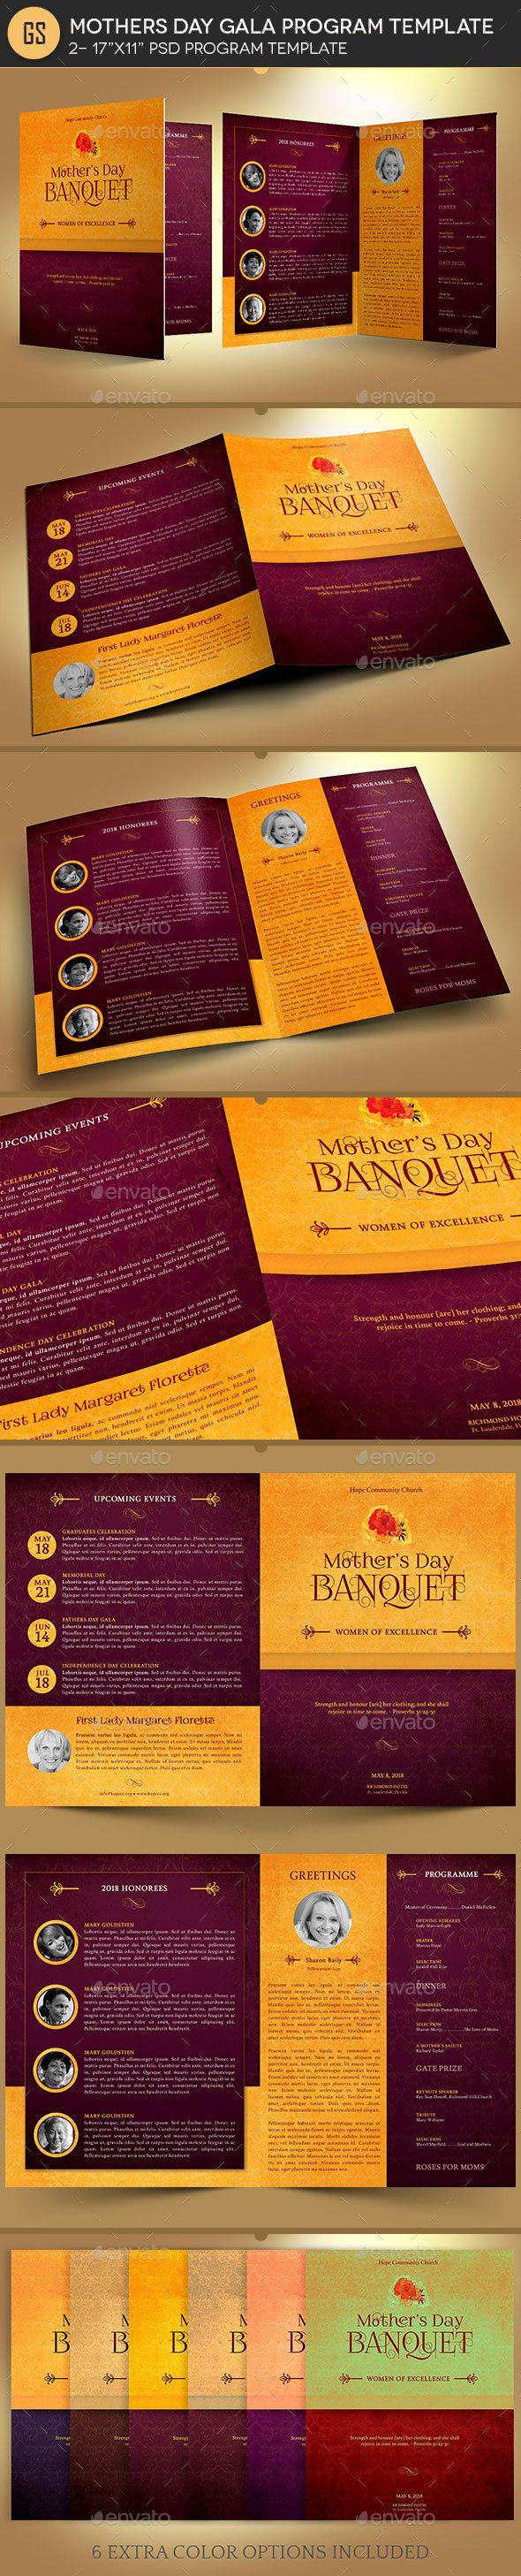 #Mothers Day Gala Program Template - #Informational #Brochures